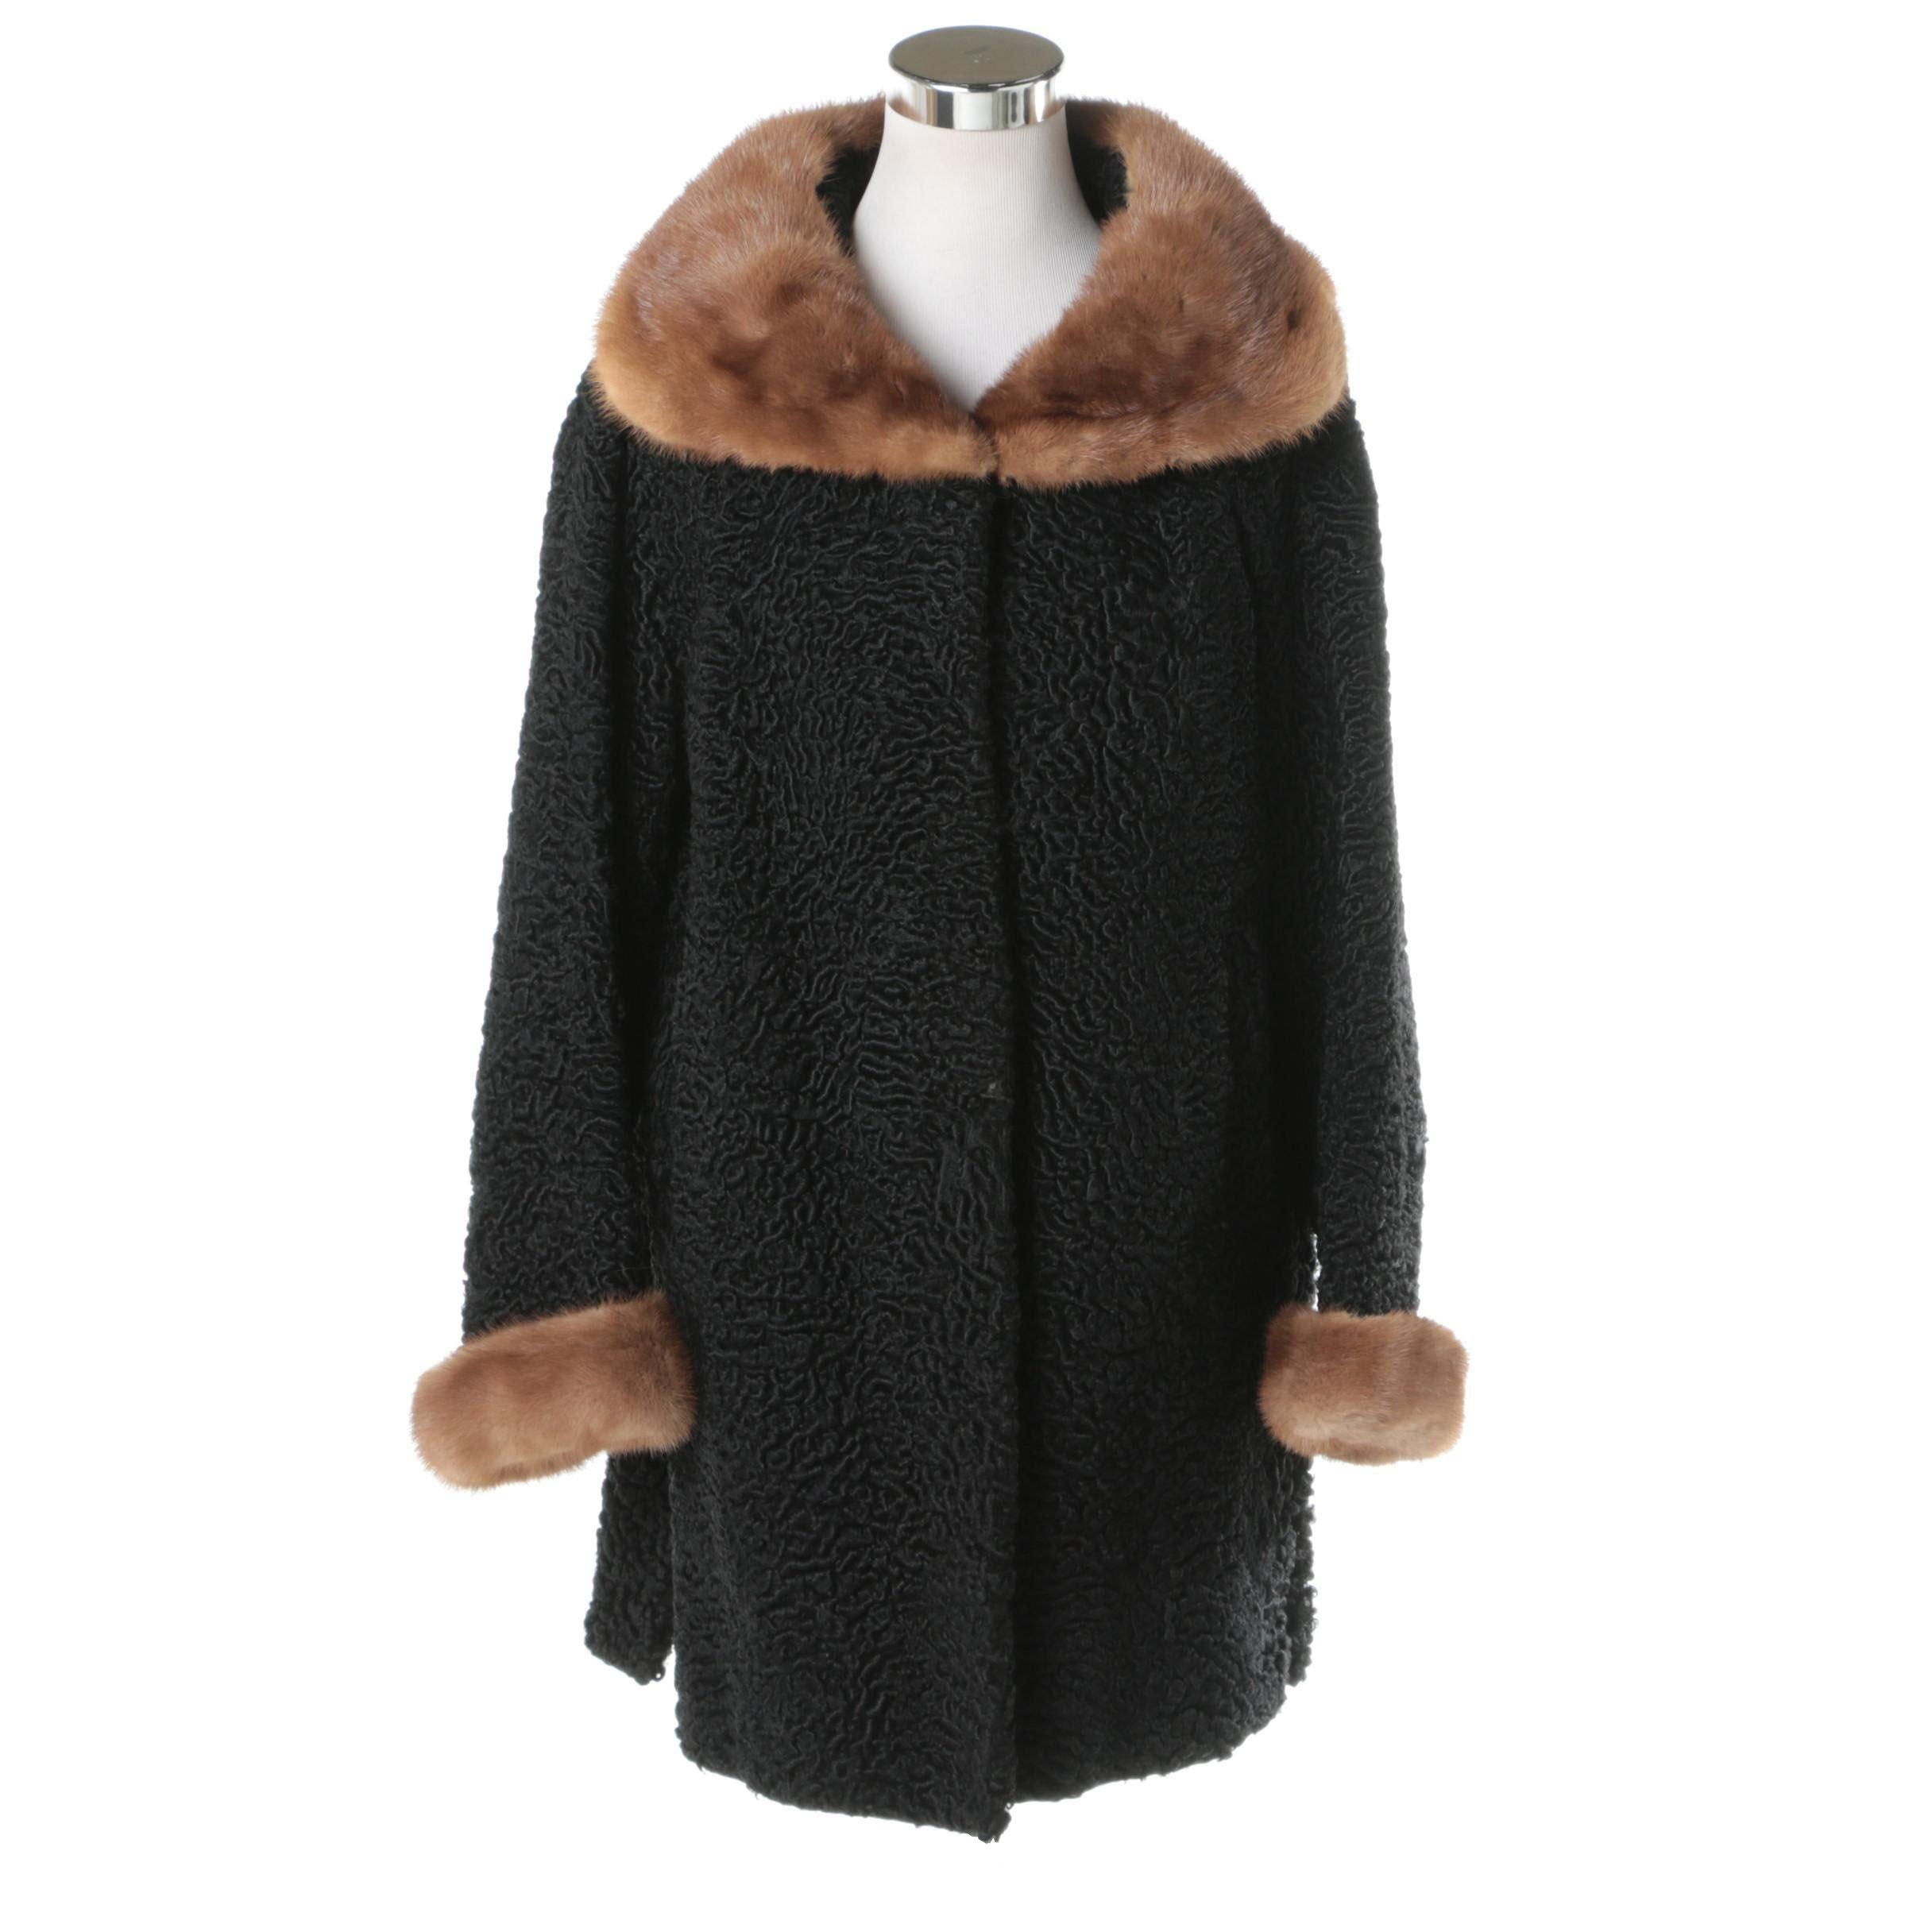 Schiaparelli Black Persian Lamb Fur Coat with Mink Fur Trim